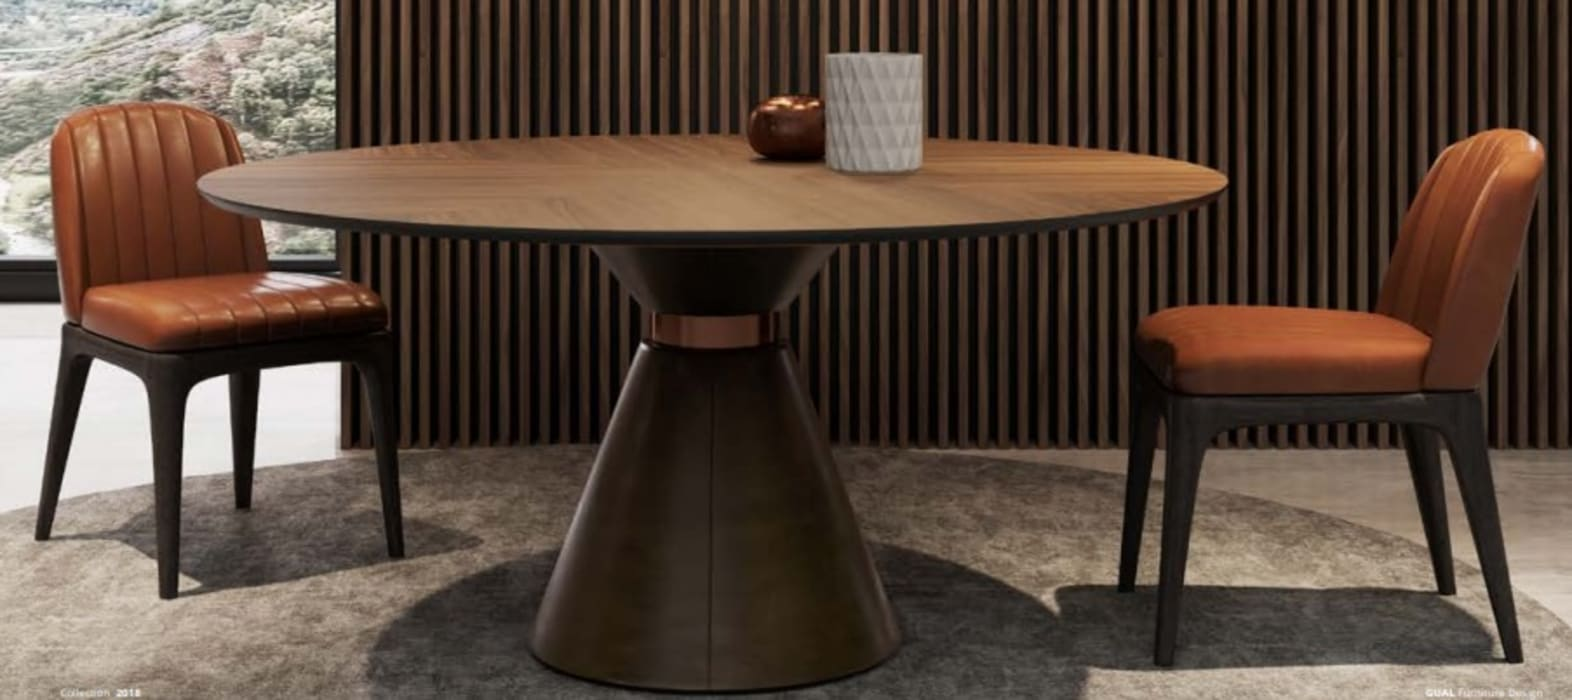 mesa redonda: Salas de estar  por CRISTINA AFONSO, Design de Interiores, uNIP. Lda